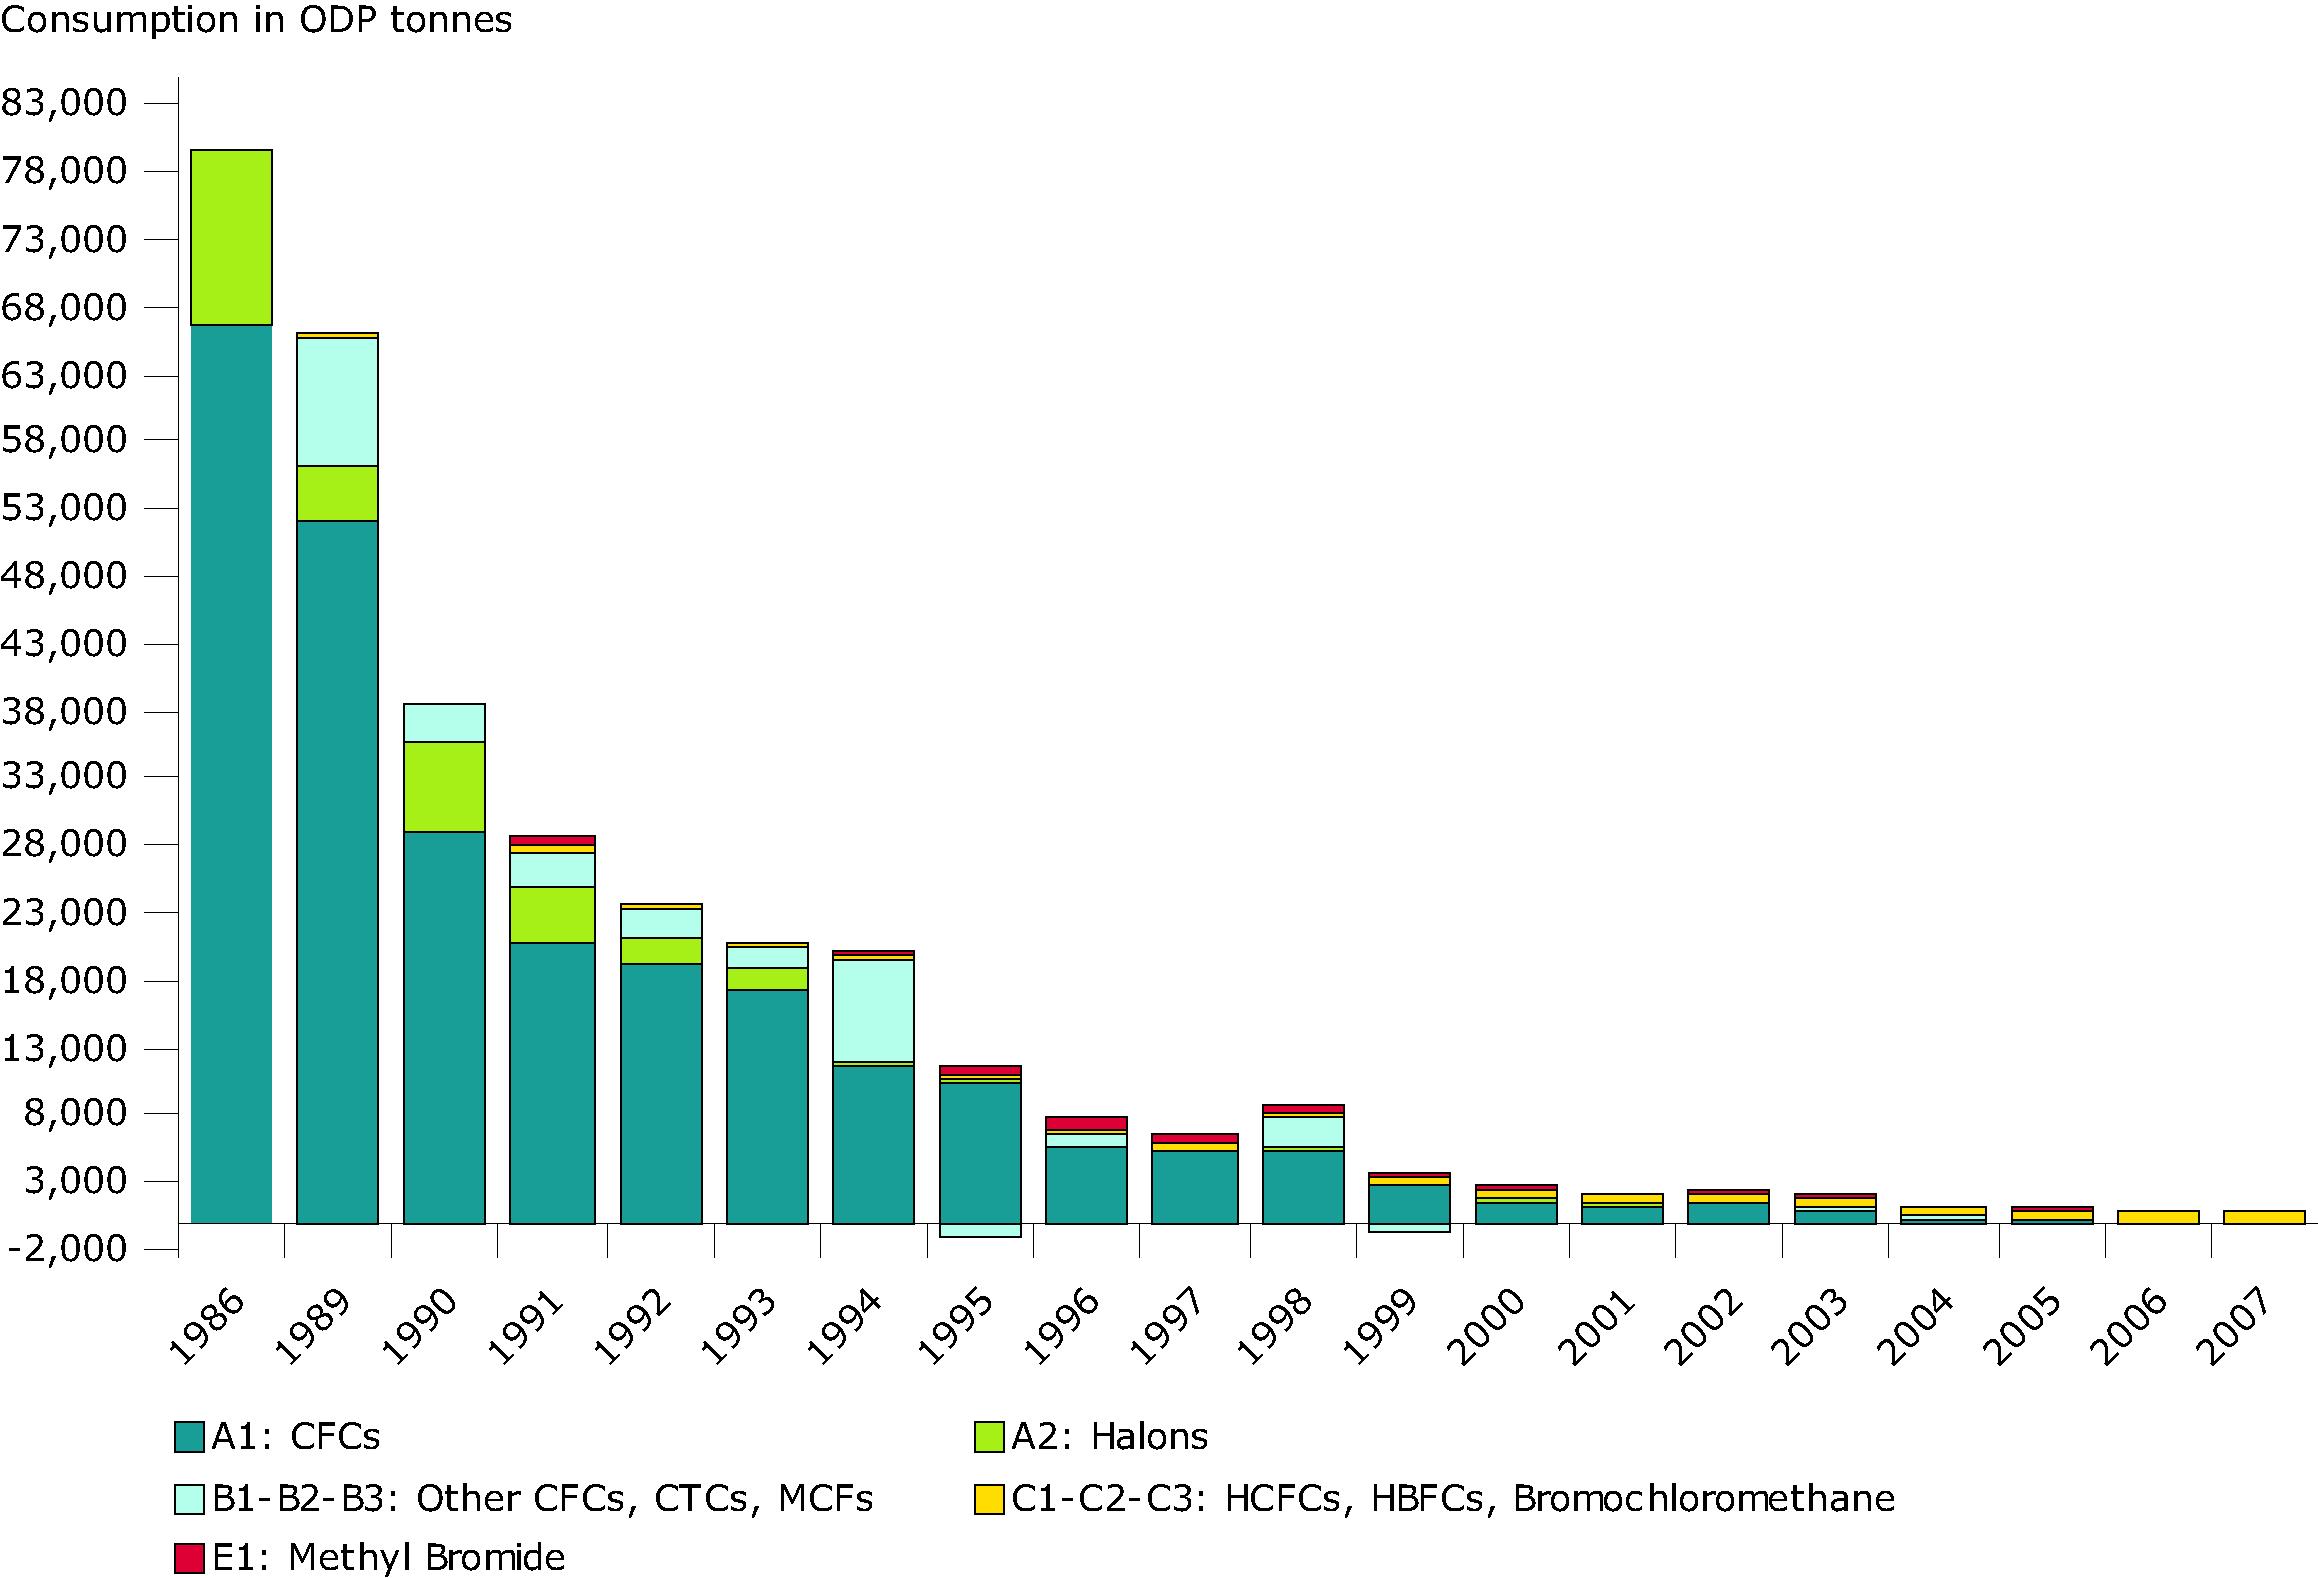 Consumption of ozone depleting substances (EU-27), 1986-2007